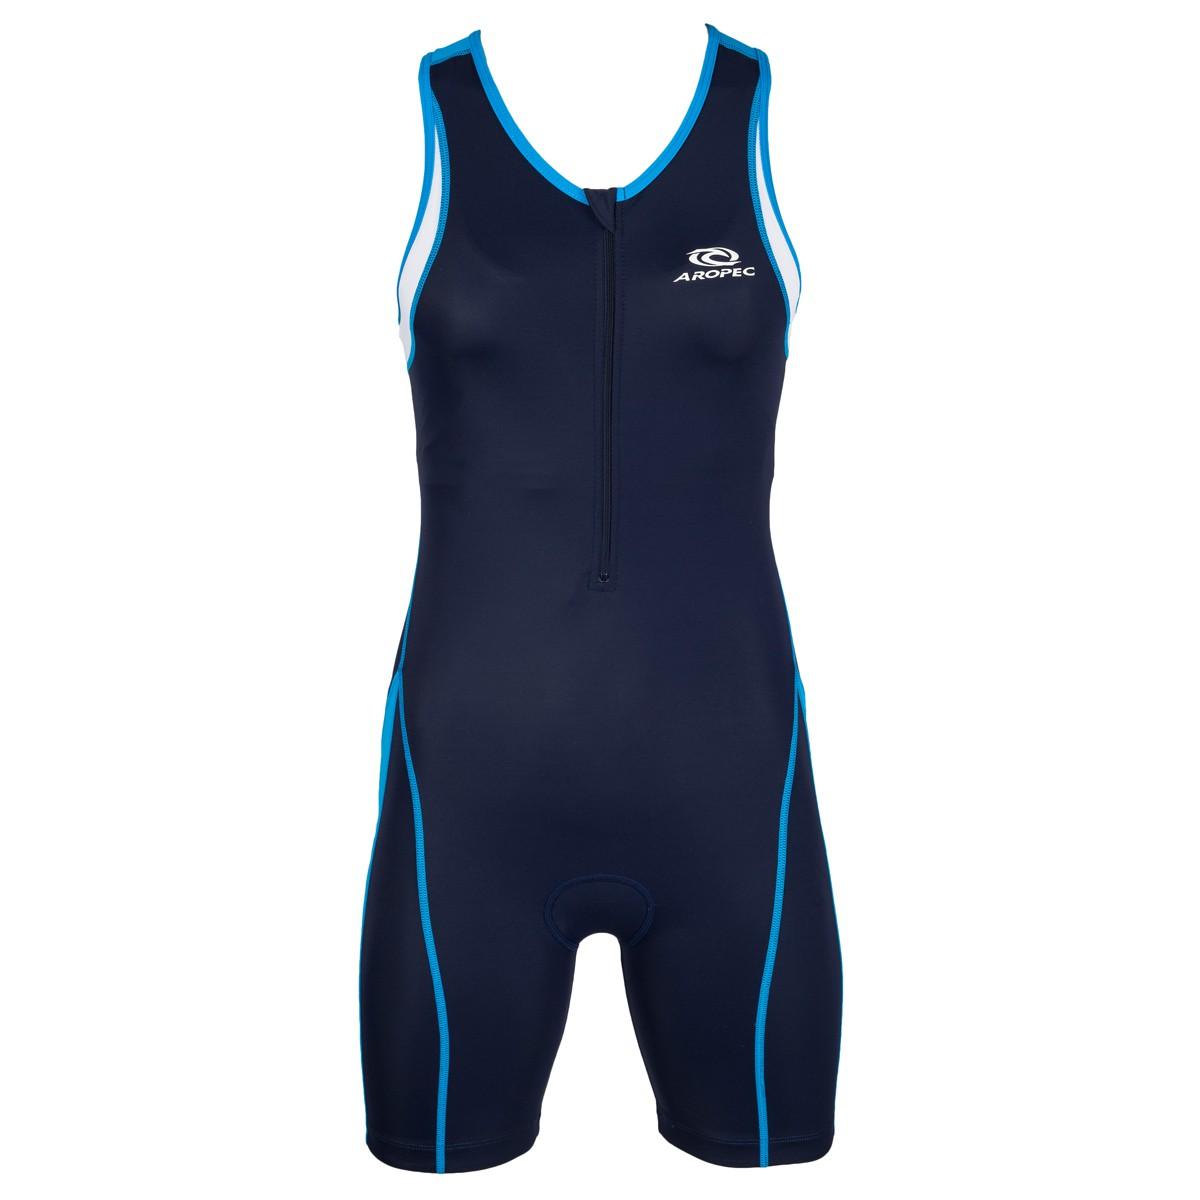 aropec 104w triathlon einteiler damen trisuit damen. Black Bedroom Furniture Sets. Home Design Ideas